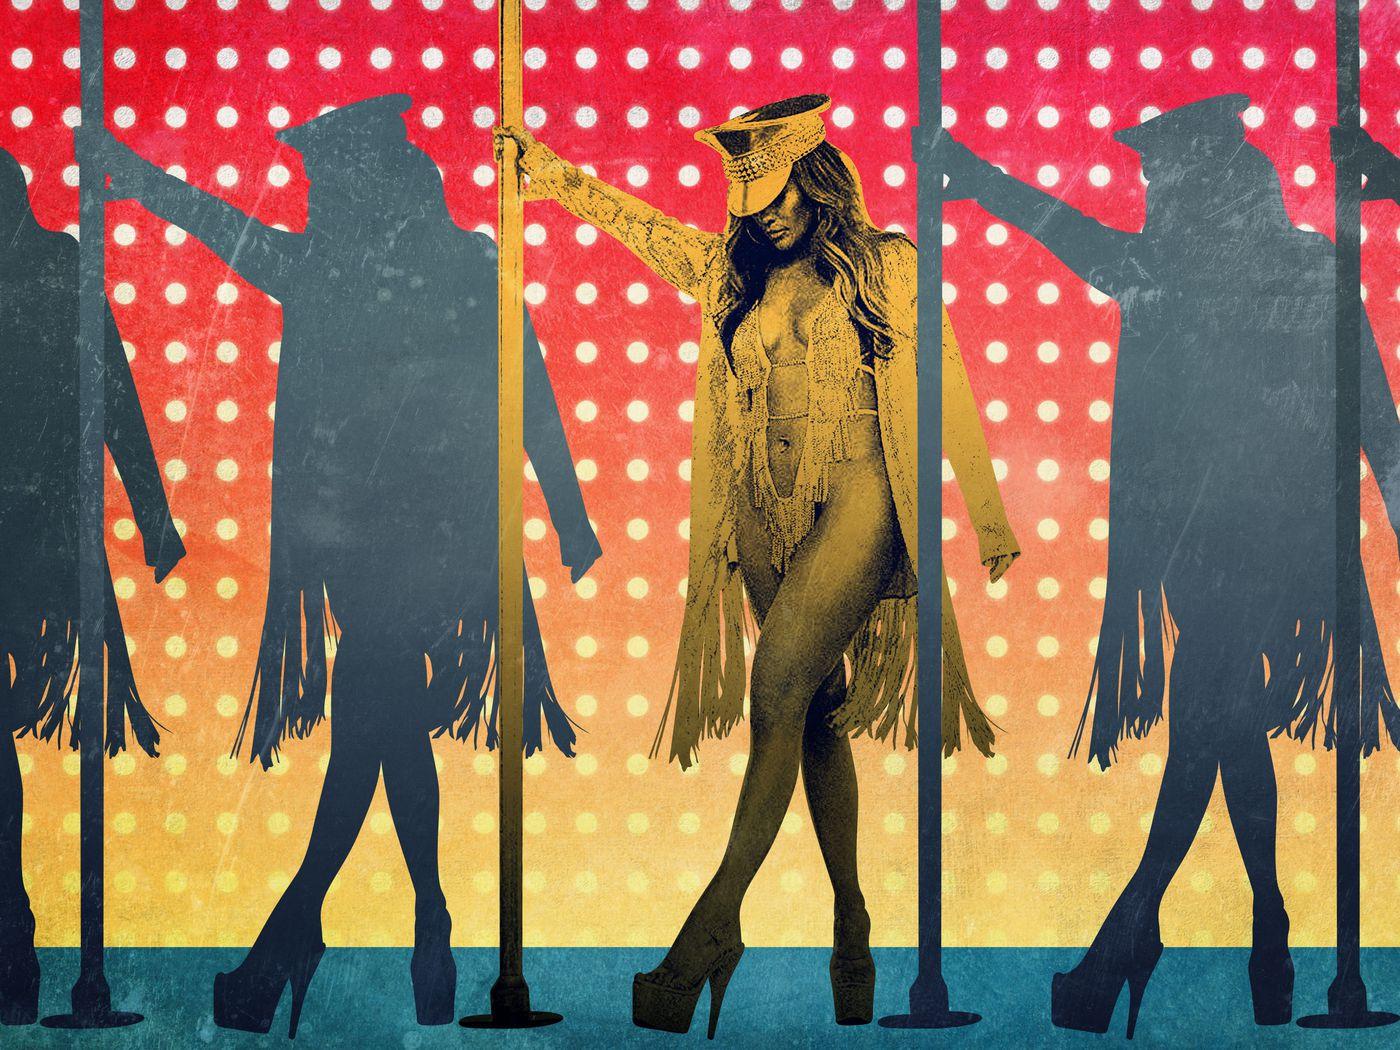 backstage im strip stripper club